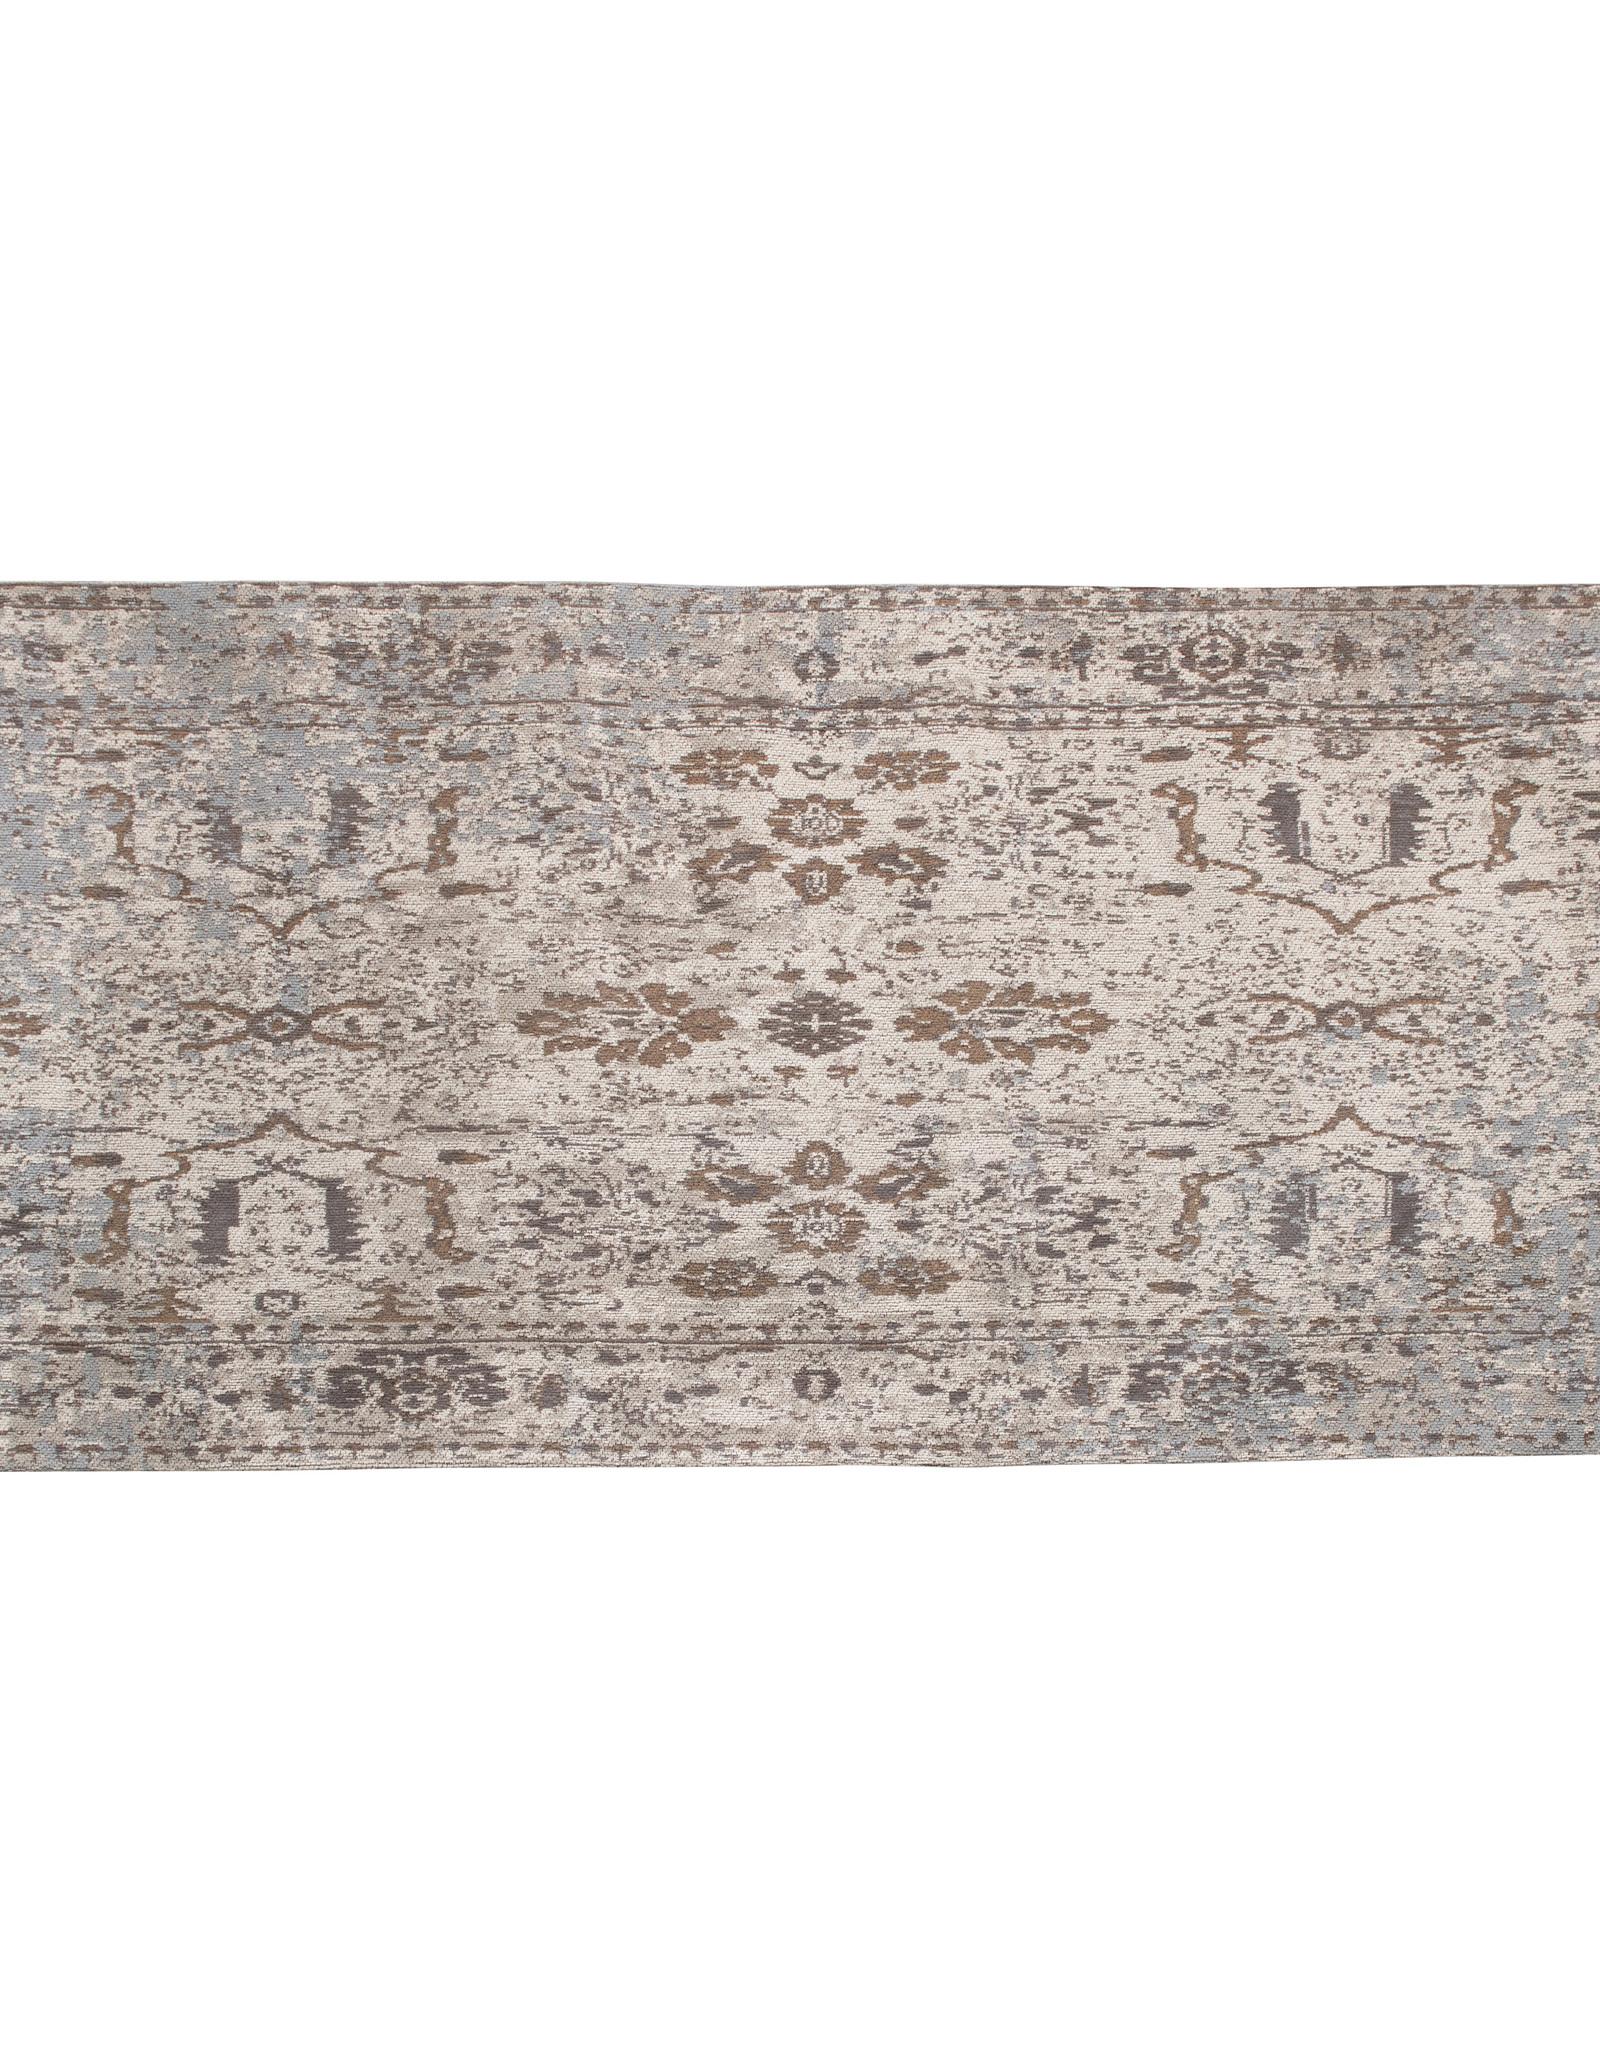 Website 2.5 x 8 Woven Cotton Printed Runner